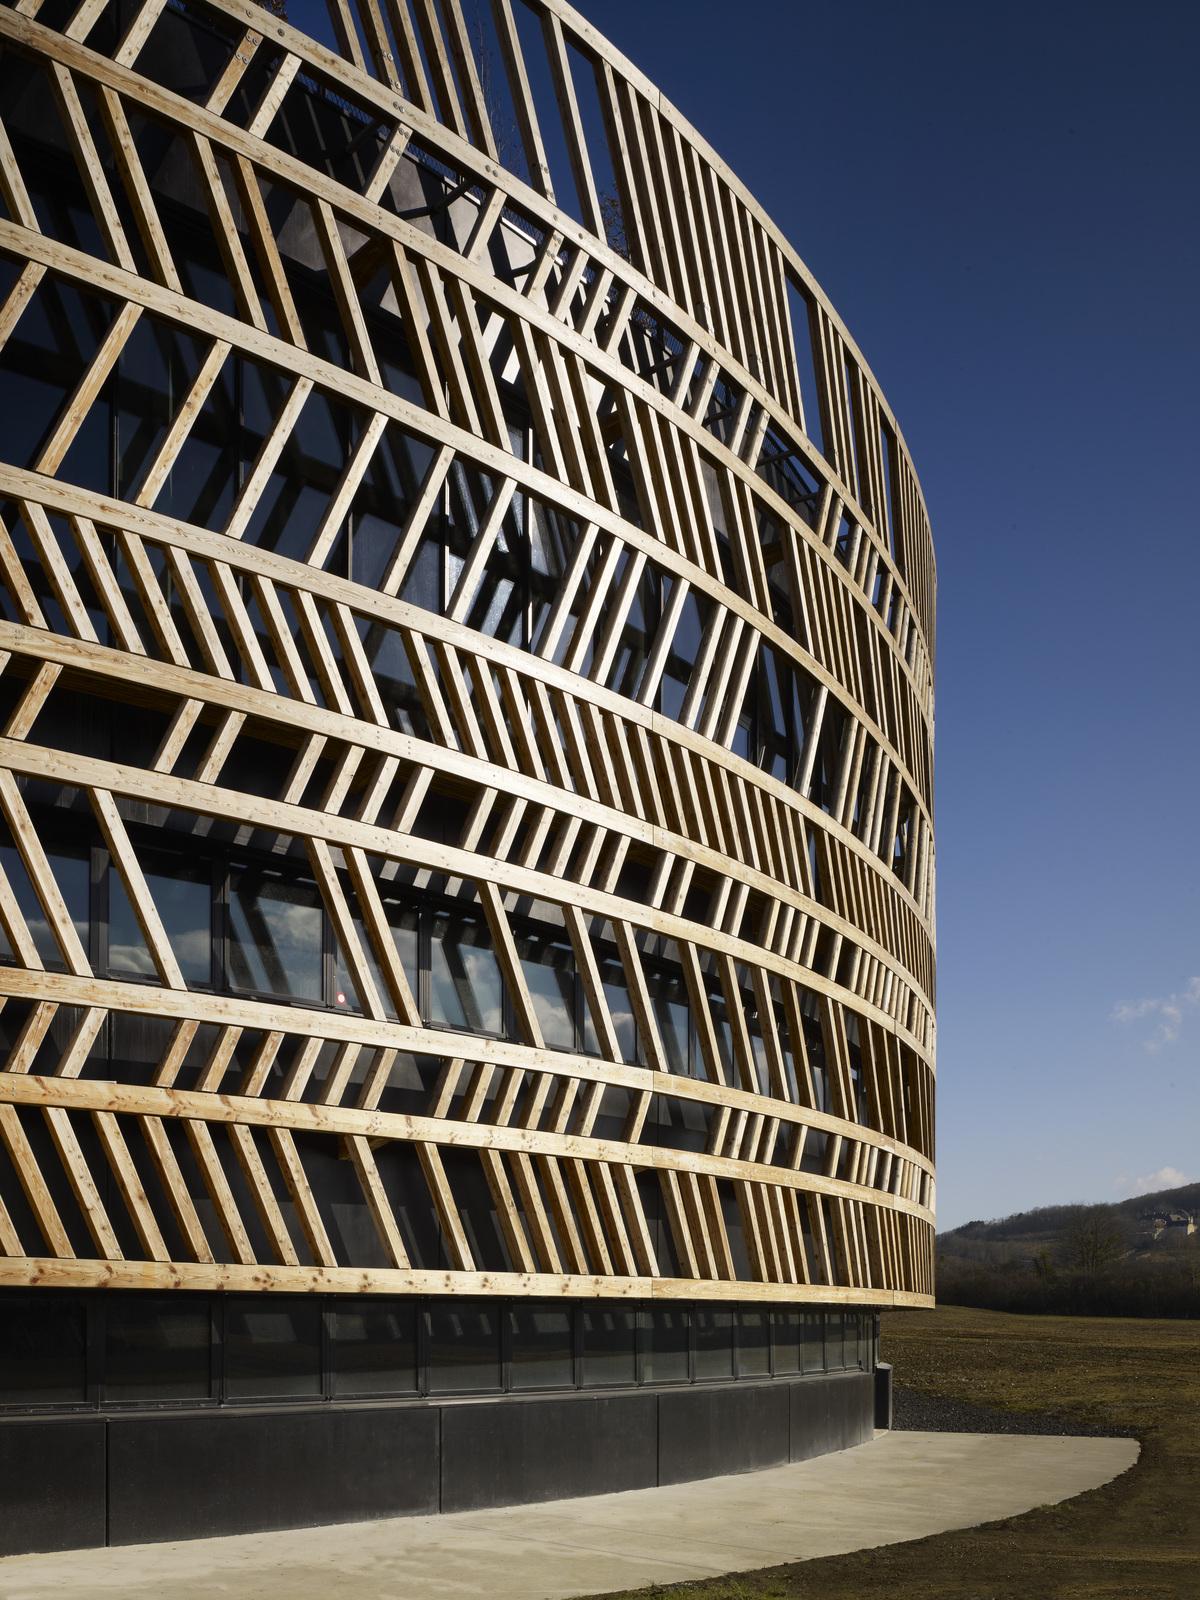 Centro de Visitantes - Museu Alésia / Bernard Tschumi Architects, © Christian Richters